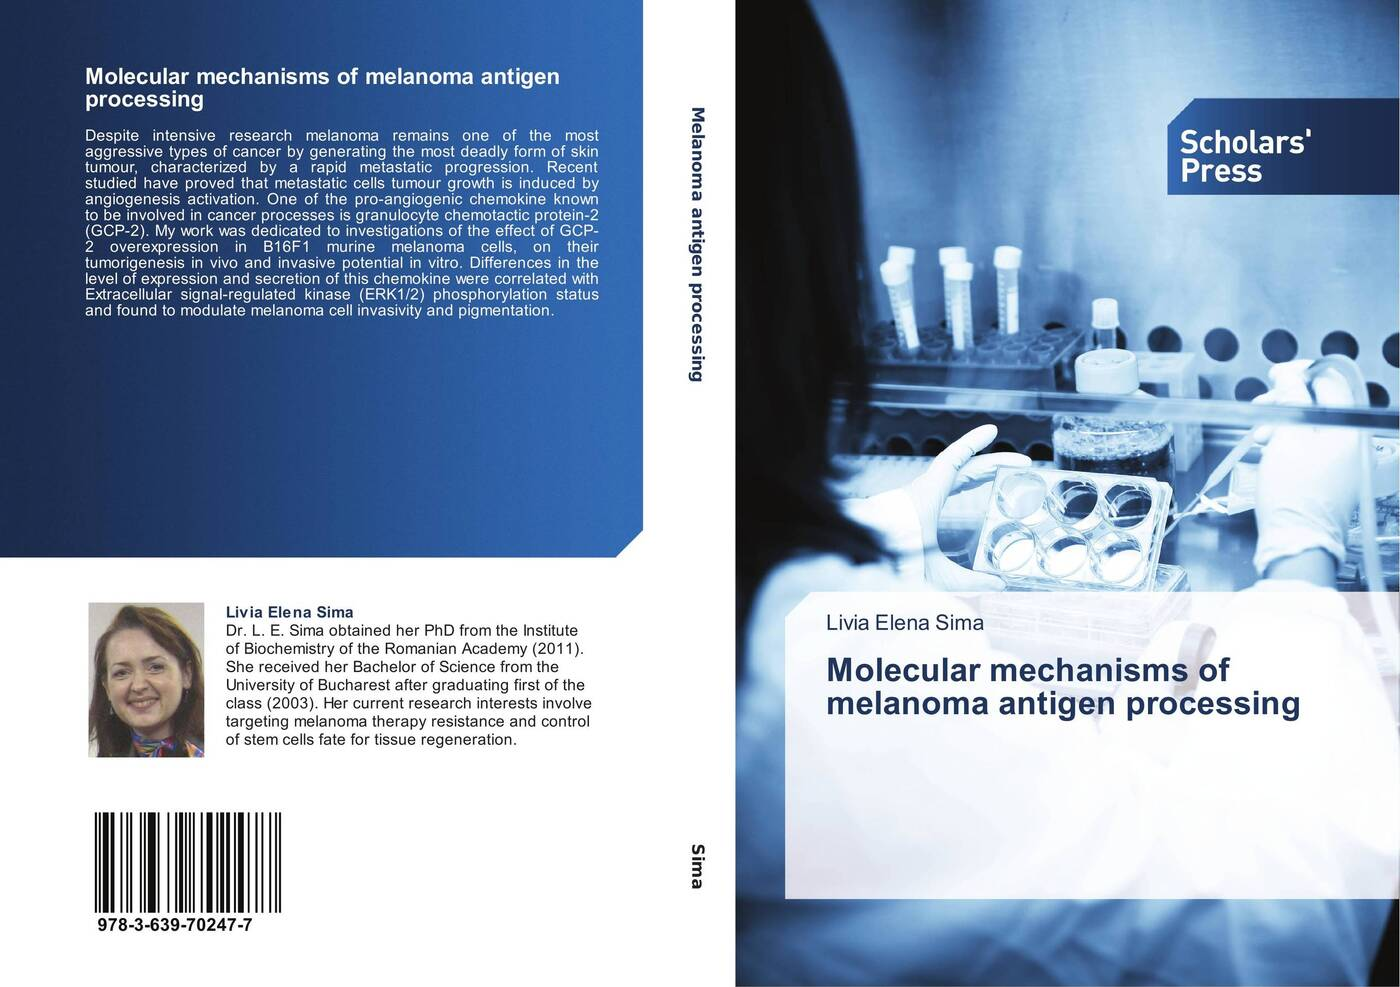 Livia Elena Sima Molecular mechanisms of melanoma antigen processing